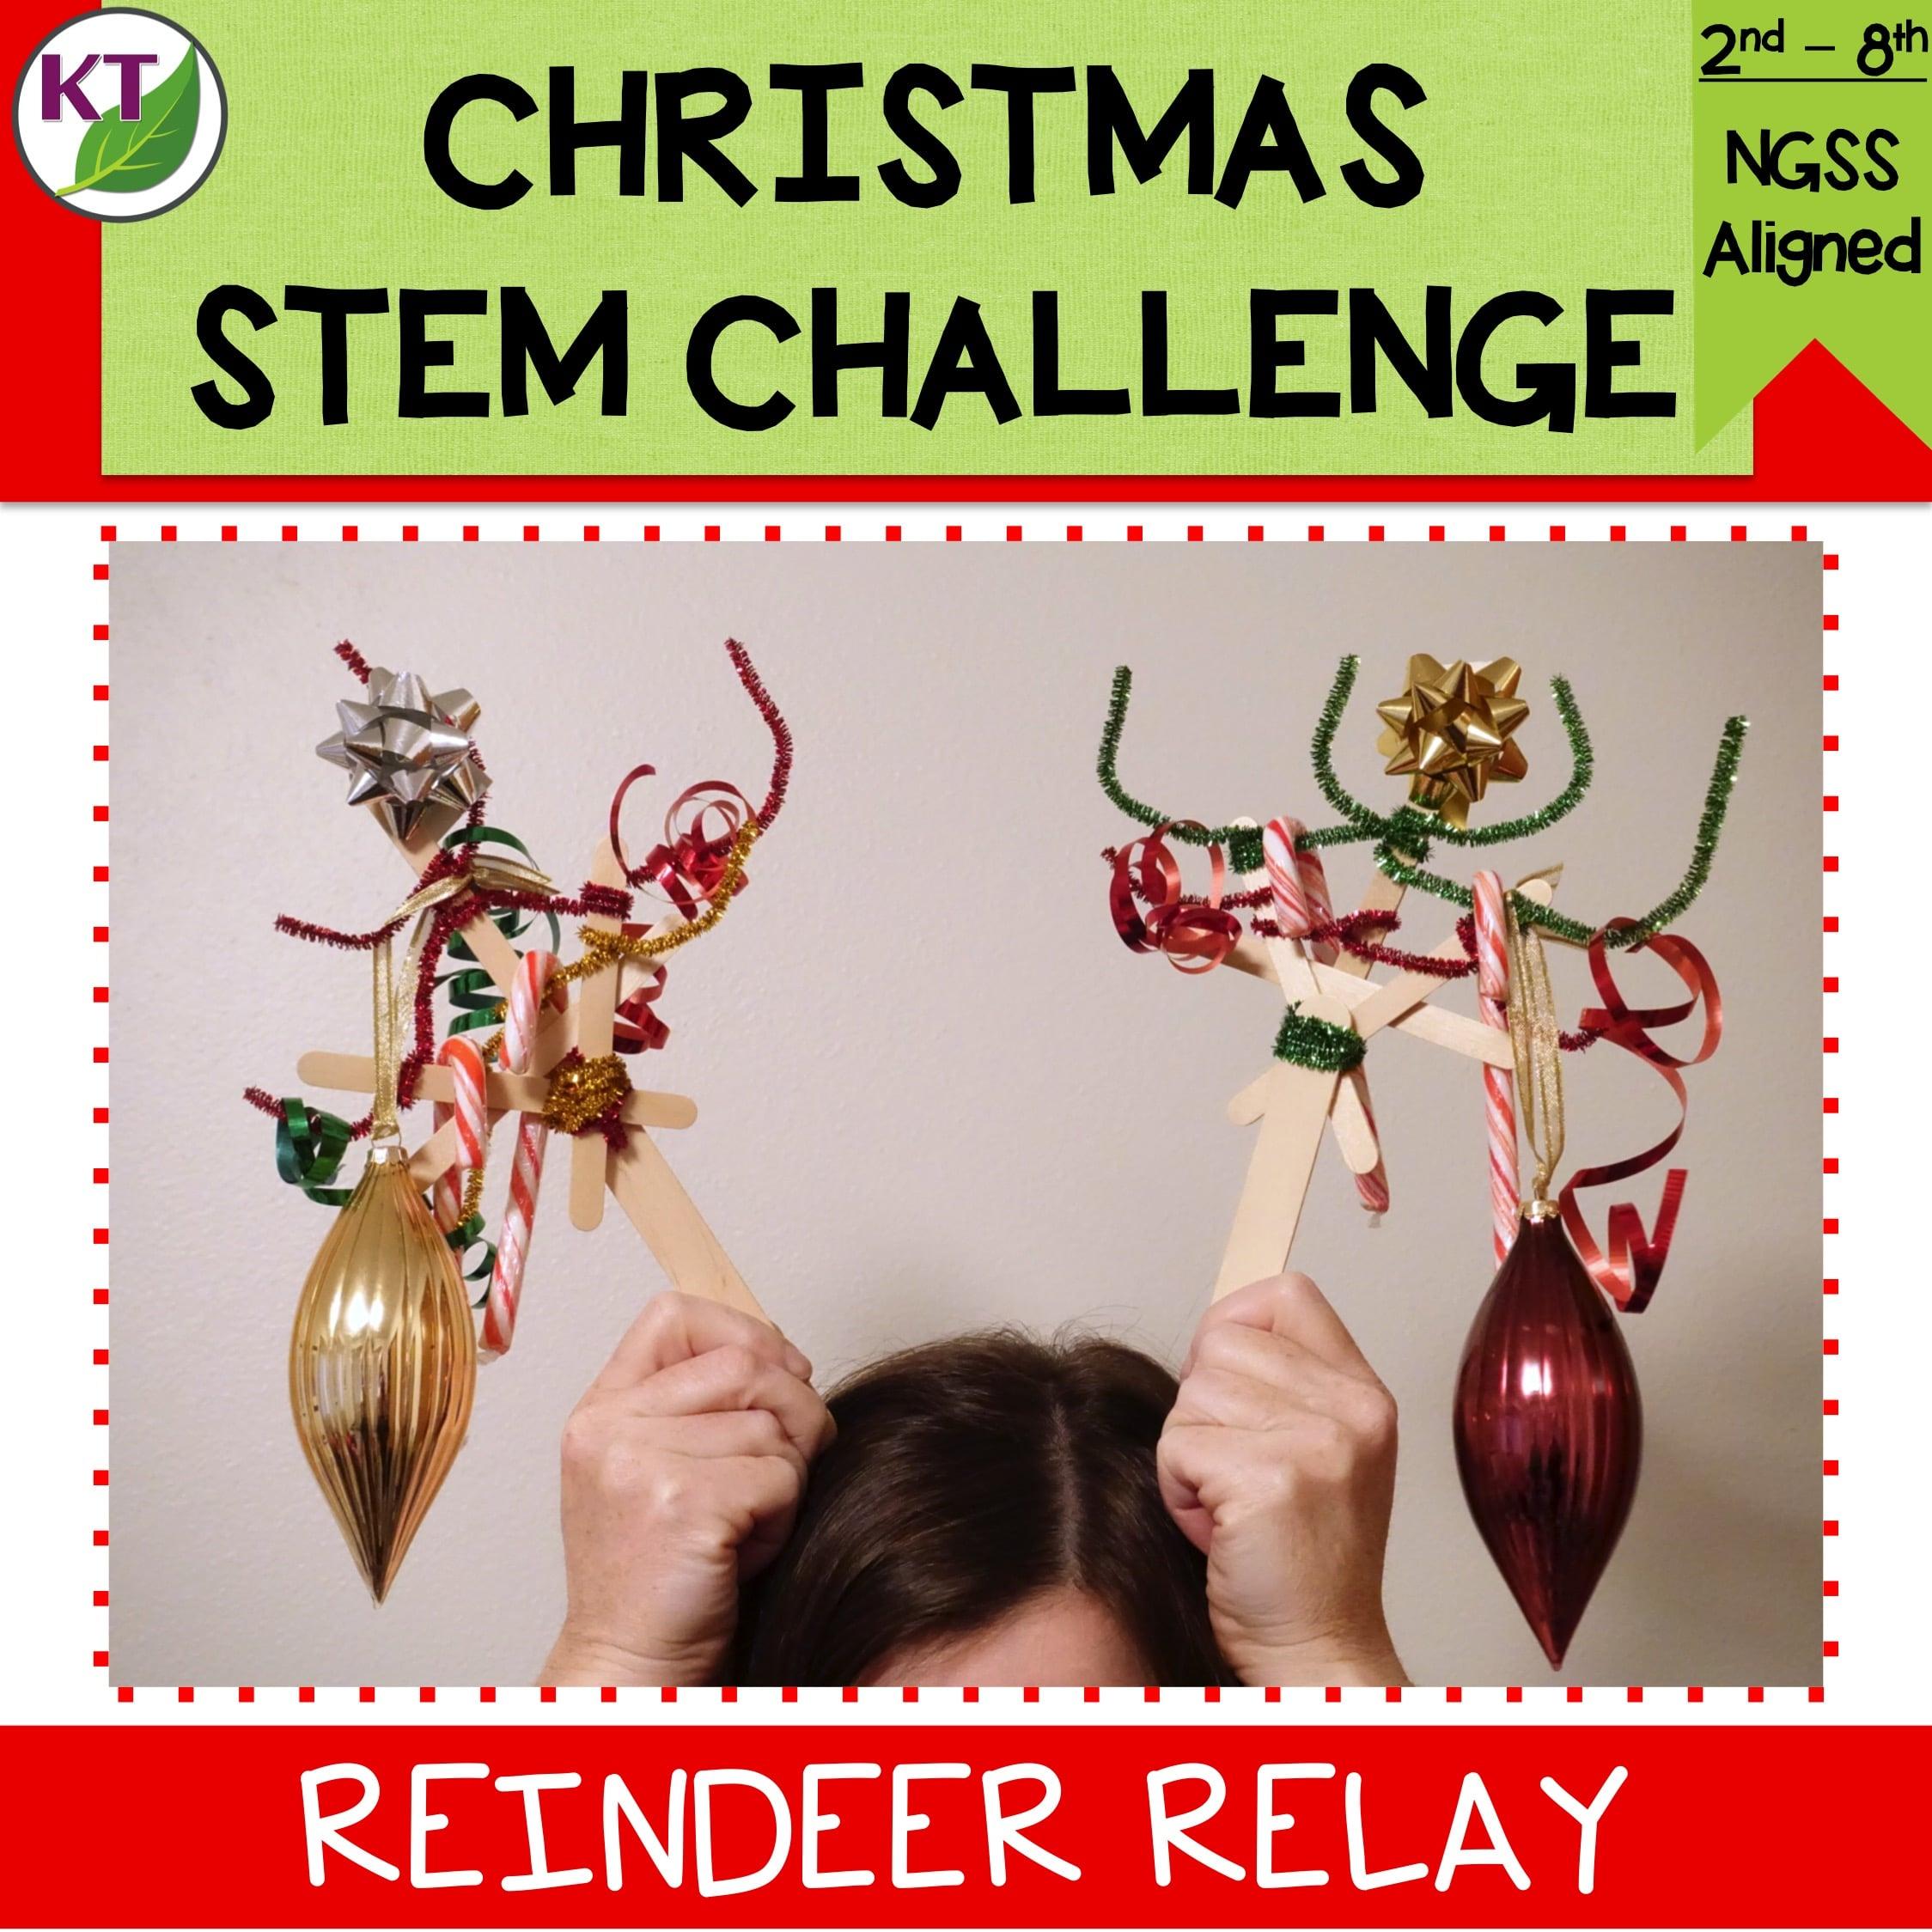 Christmas Stem Challenges.Reindeer Relay Christmas Stem Challenge